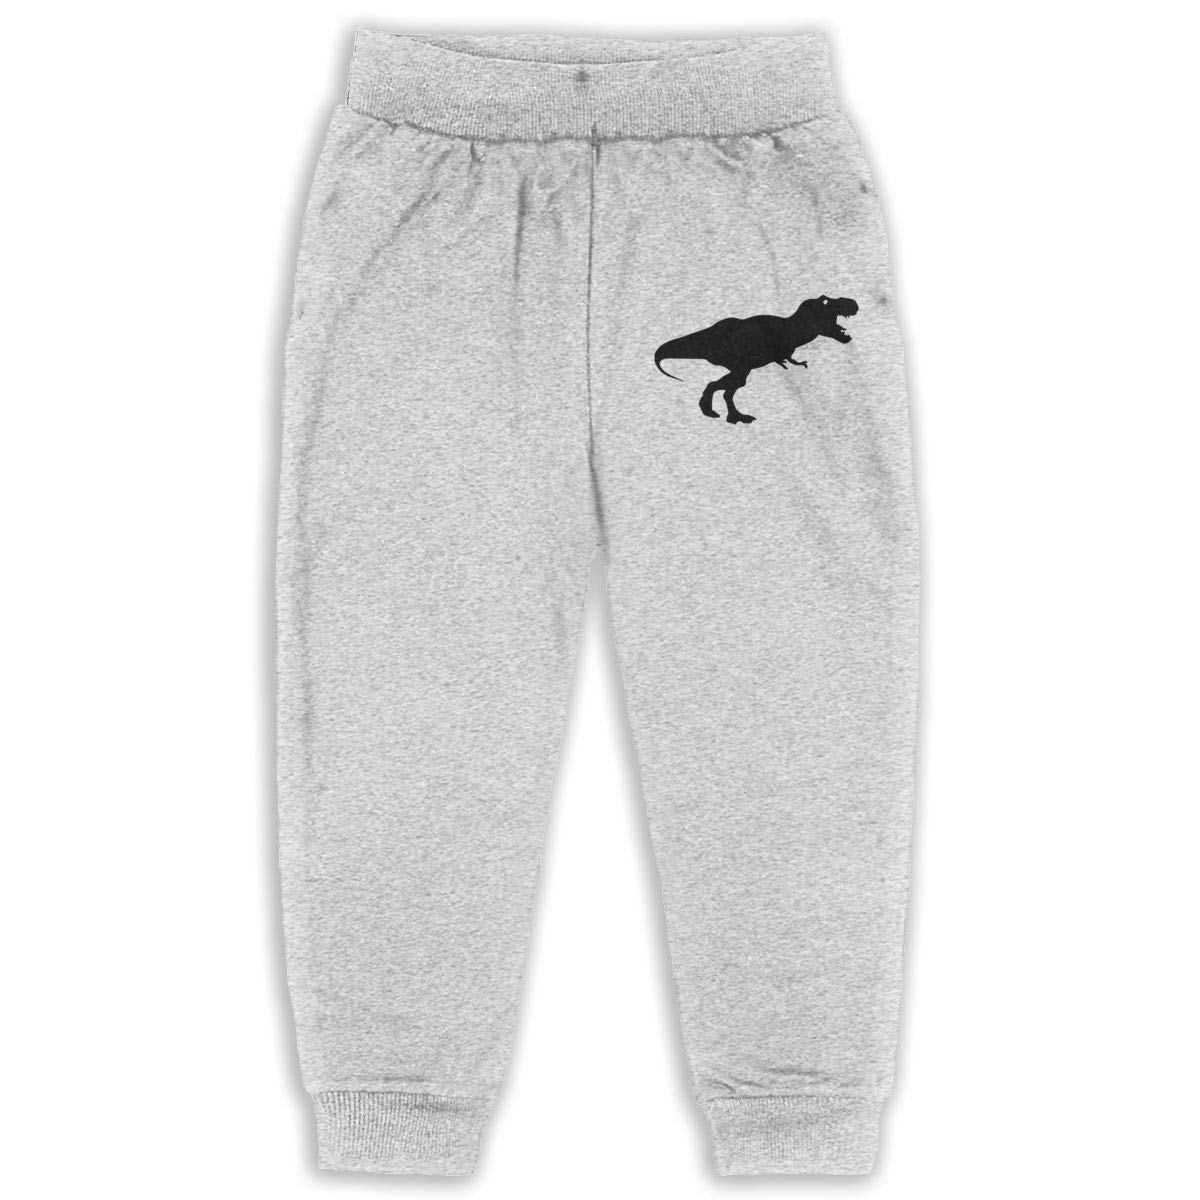 JOAPNWJ Smile Good Morning Children Cartoon Cotton Sweatpants Sport Jogger Elastic Pants